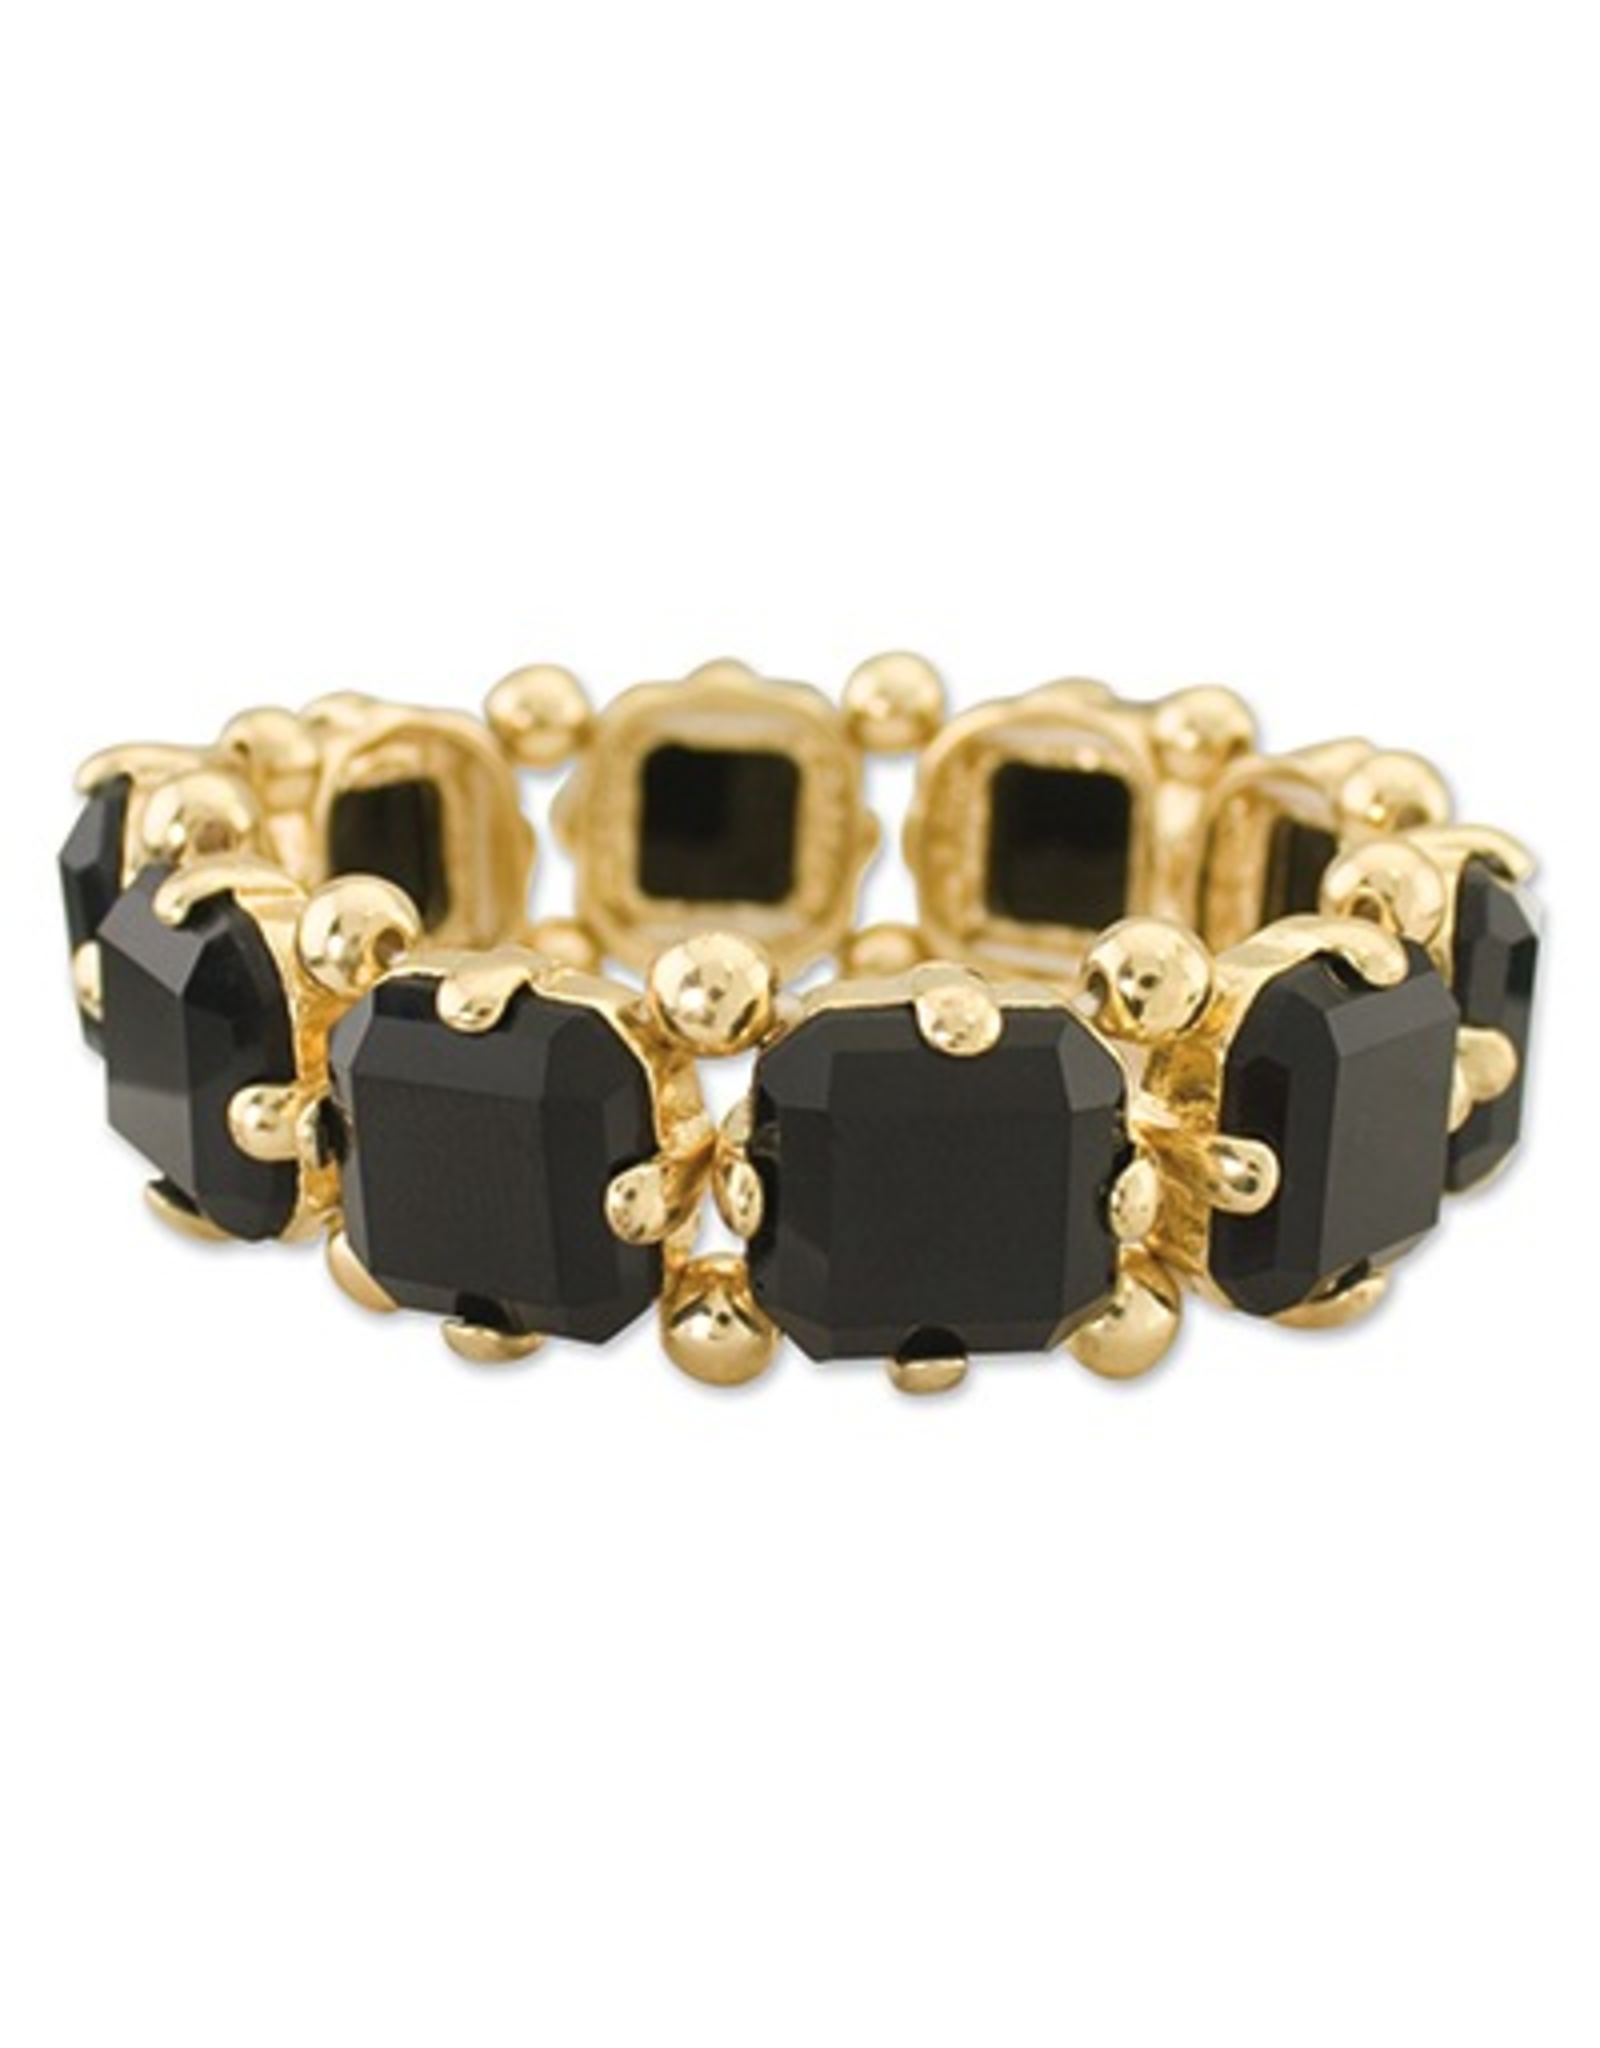 Periwinkle Bracelet Jet Faceted Squares set in Gold - Stretch